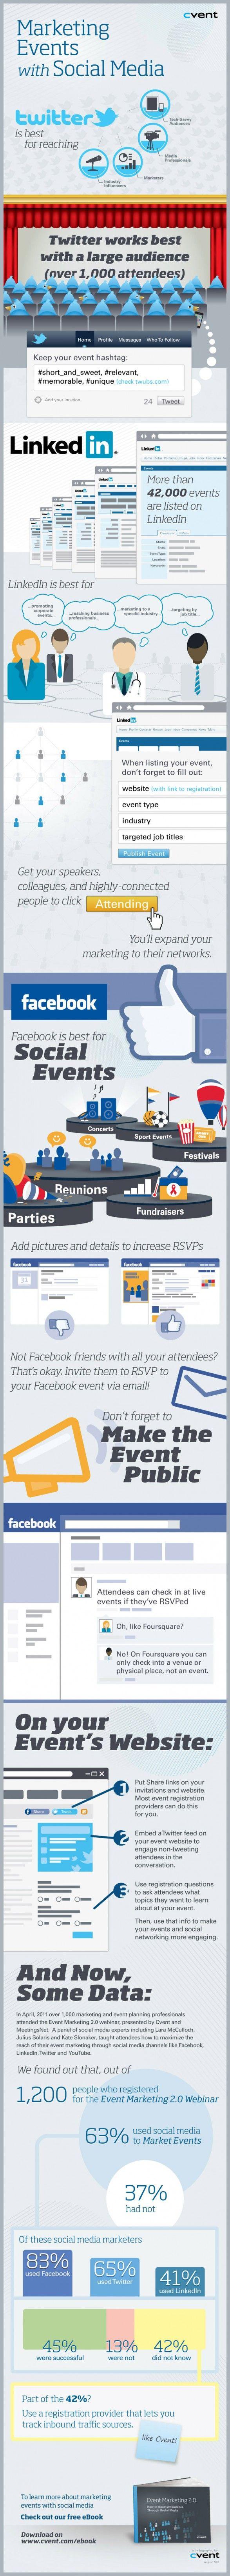 Social Media Marketing [Infographic]